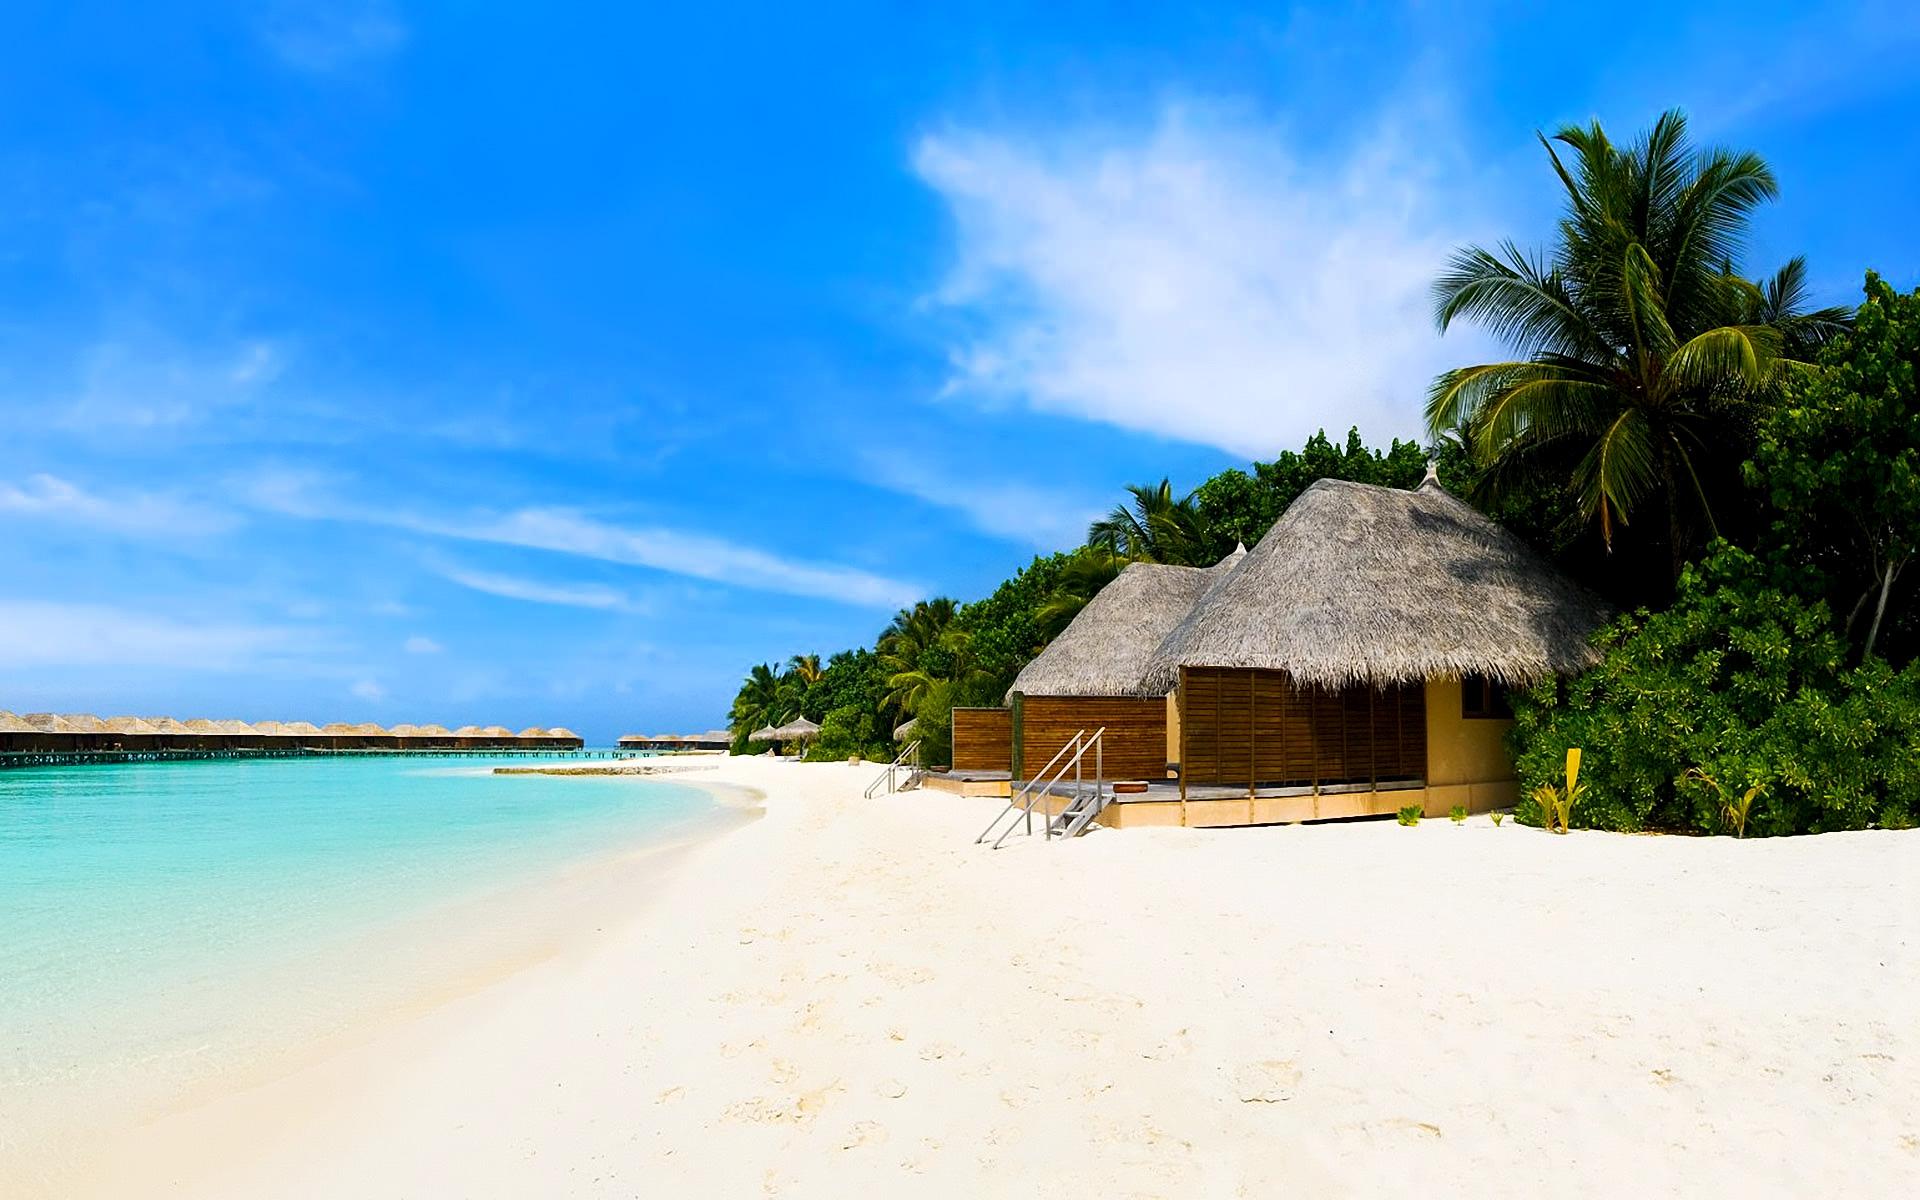 Beach bungalows on the tropical island wallpaper   Beach Wallpapers 1920x1200